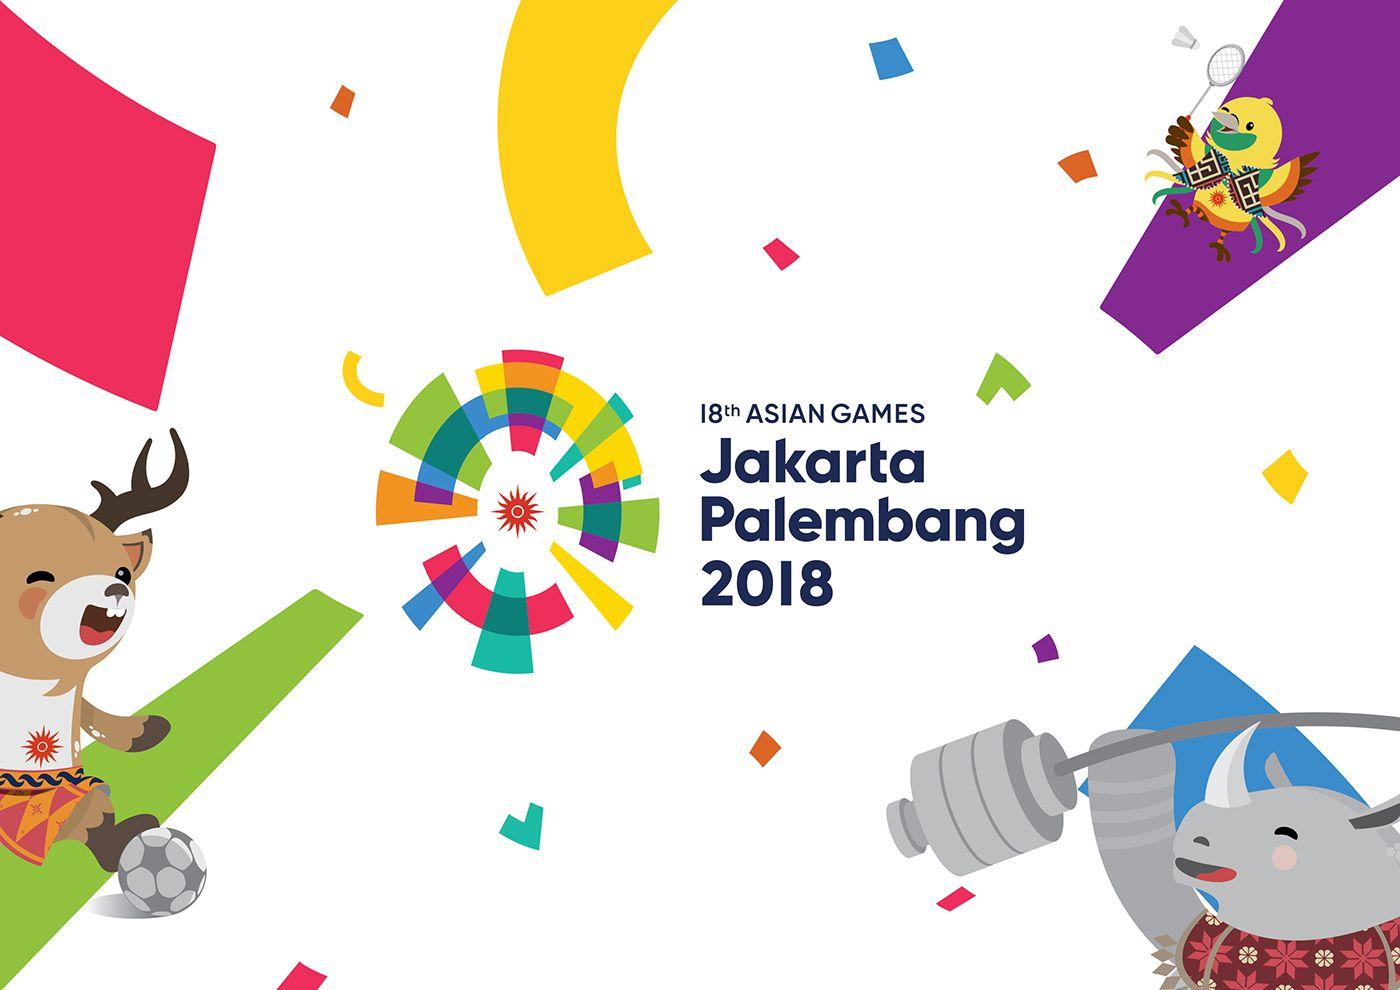 Pin by heikalasona on Icon design | Asian Games, Game 2018, Games